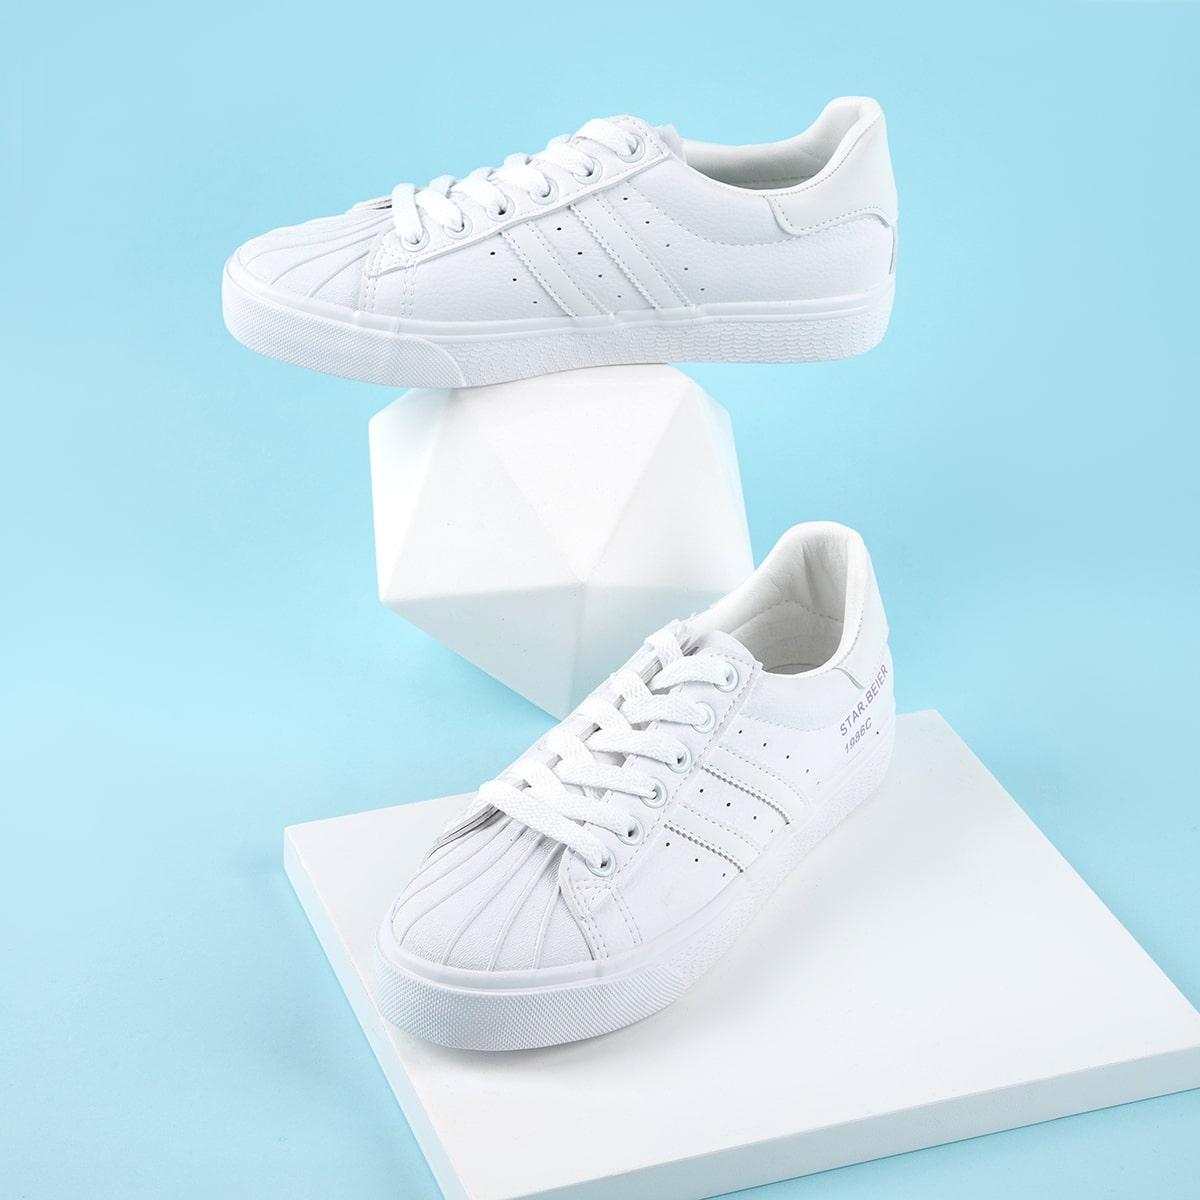 Zapatos arriba baja con cordón delantero